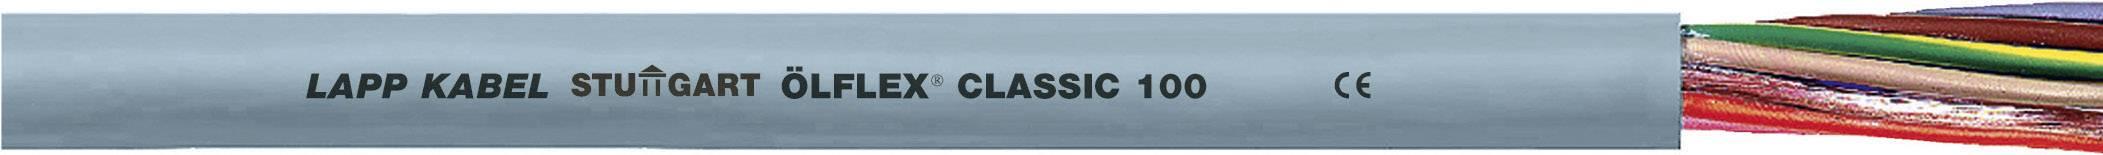 Kabel LappKabel Ölflex CLASSIC 100 3X1 (00102034), PVC, 6 mm, 500 V, šedá, 50 m